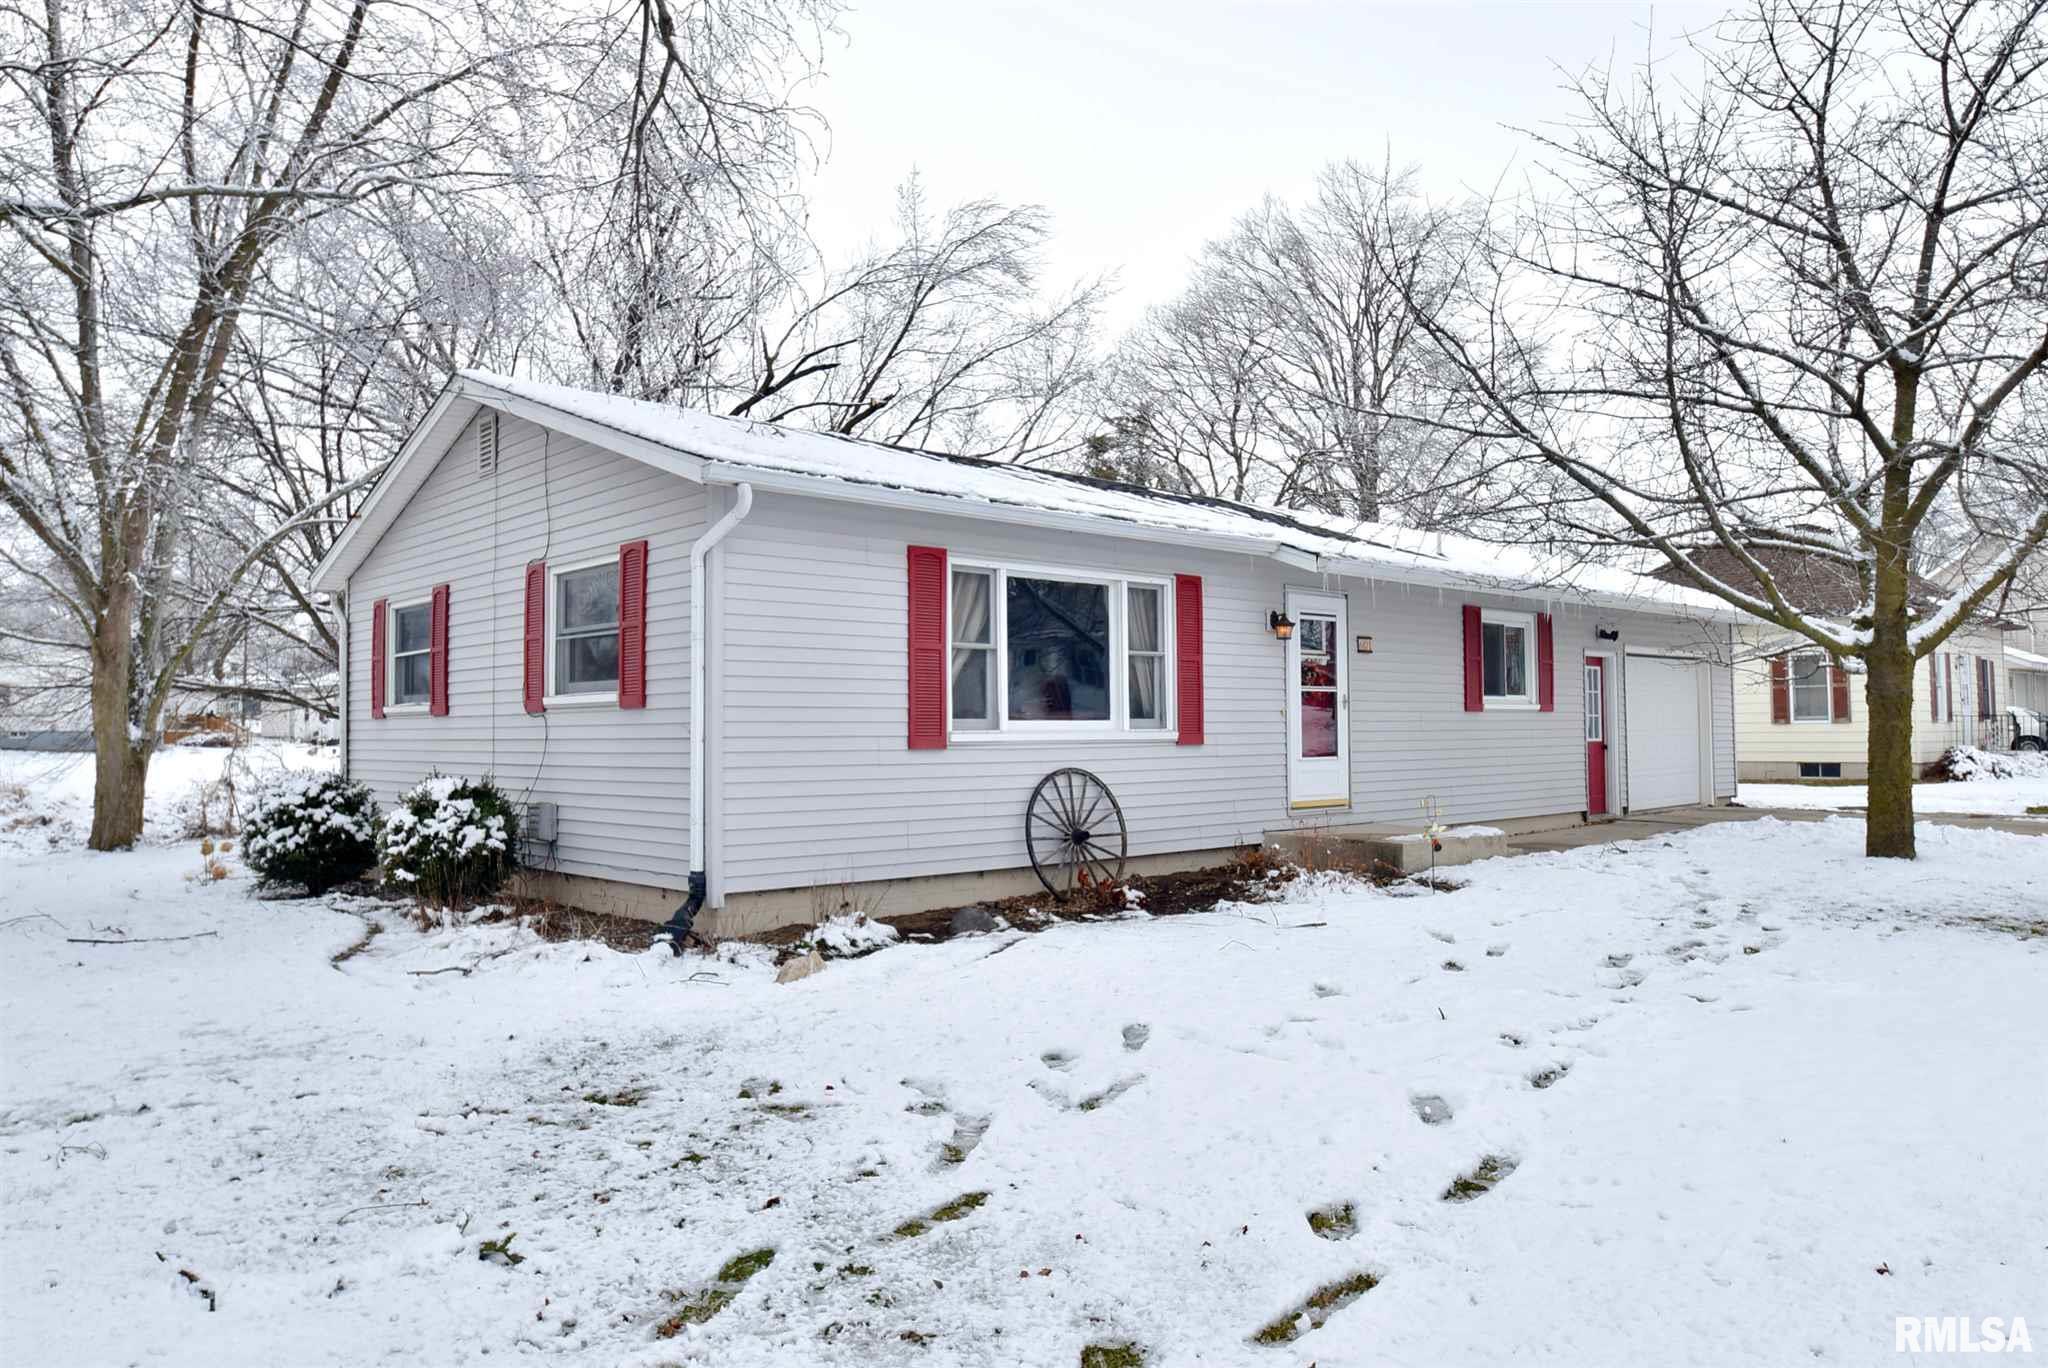 601 N MONROE Property Photo - Roanoke, IL real estate listing